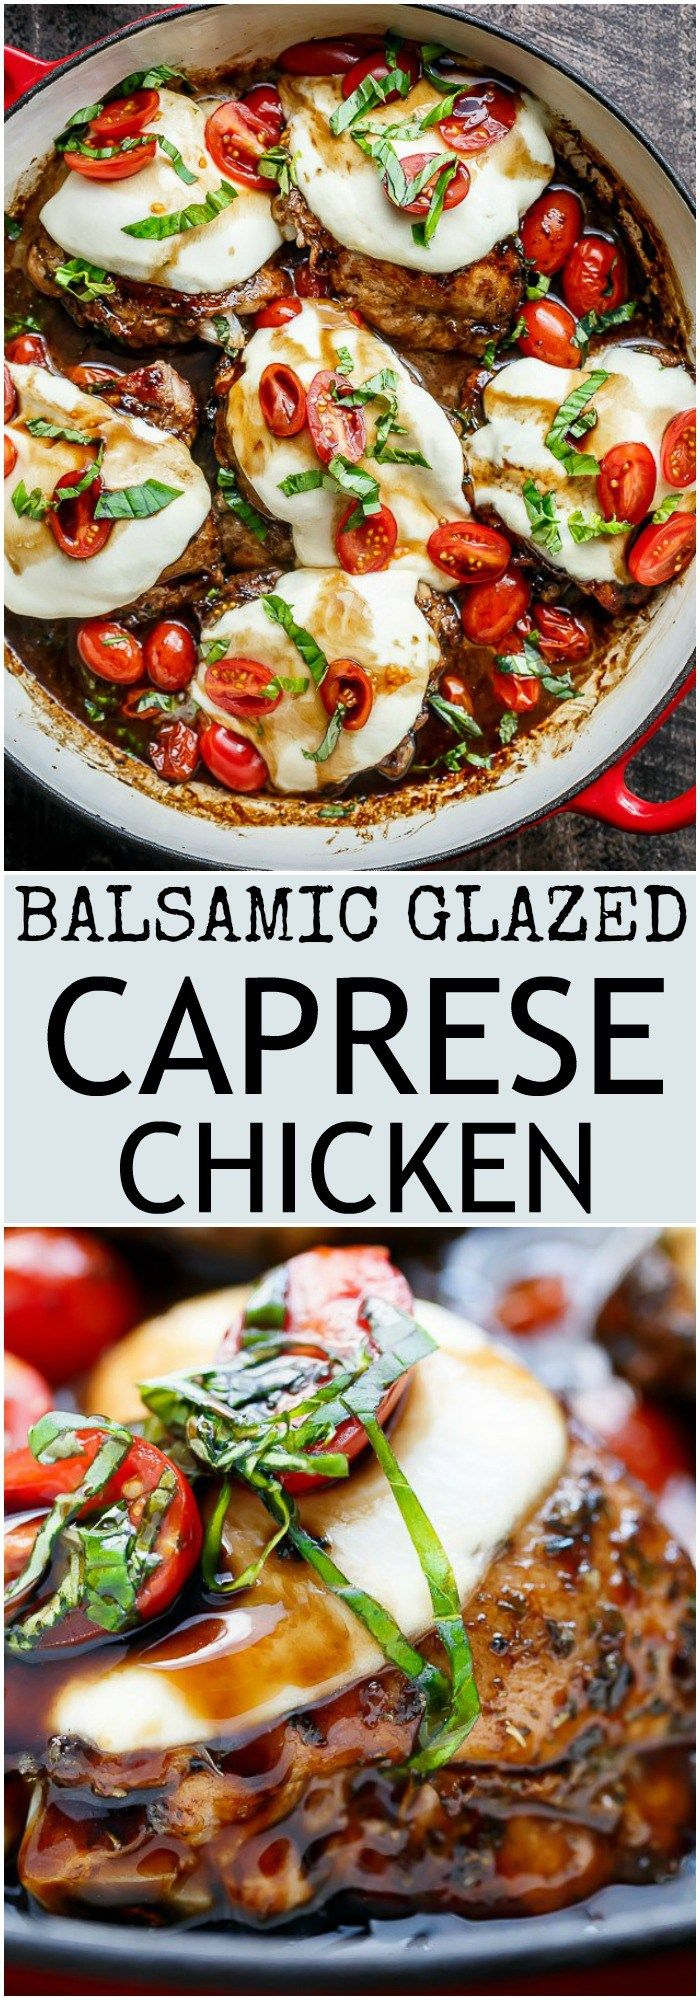 Balsamic Glazed Caprese Chicken.